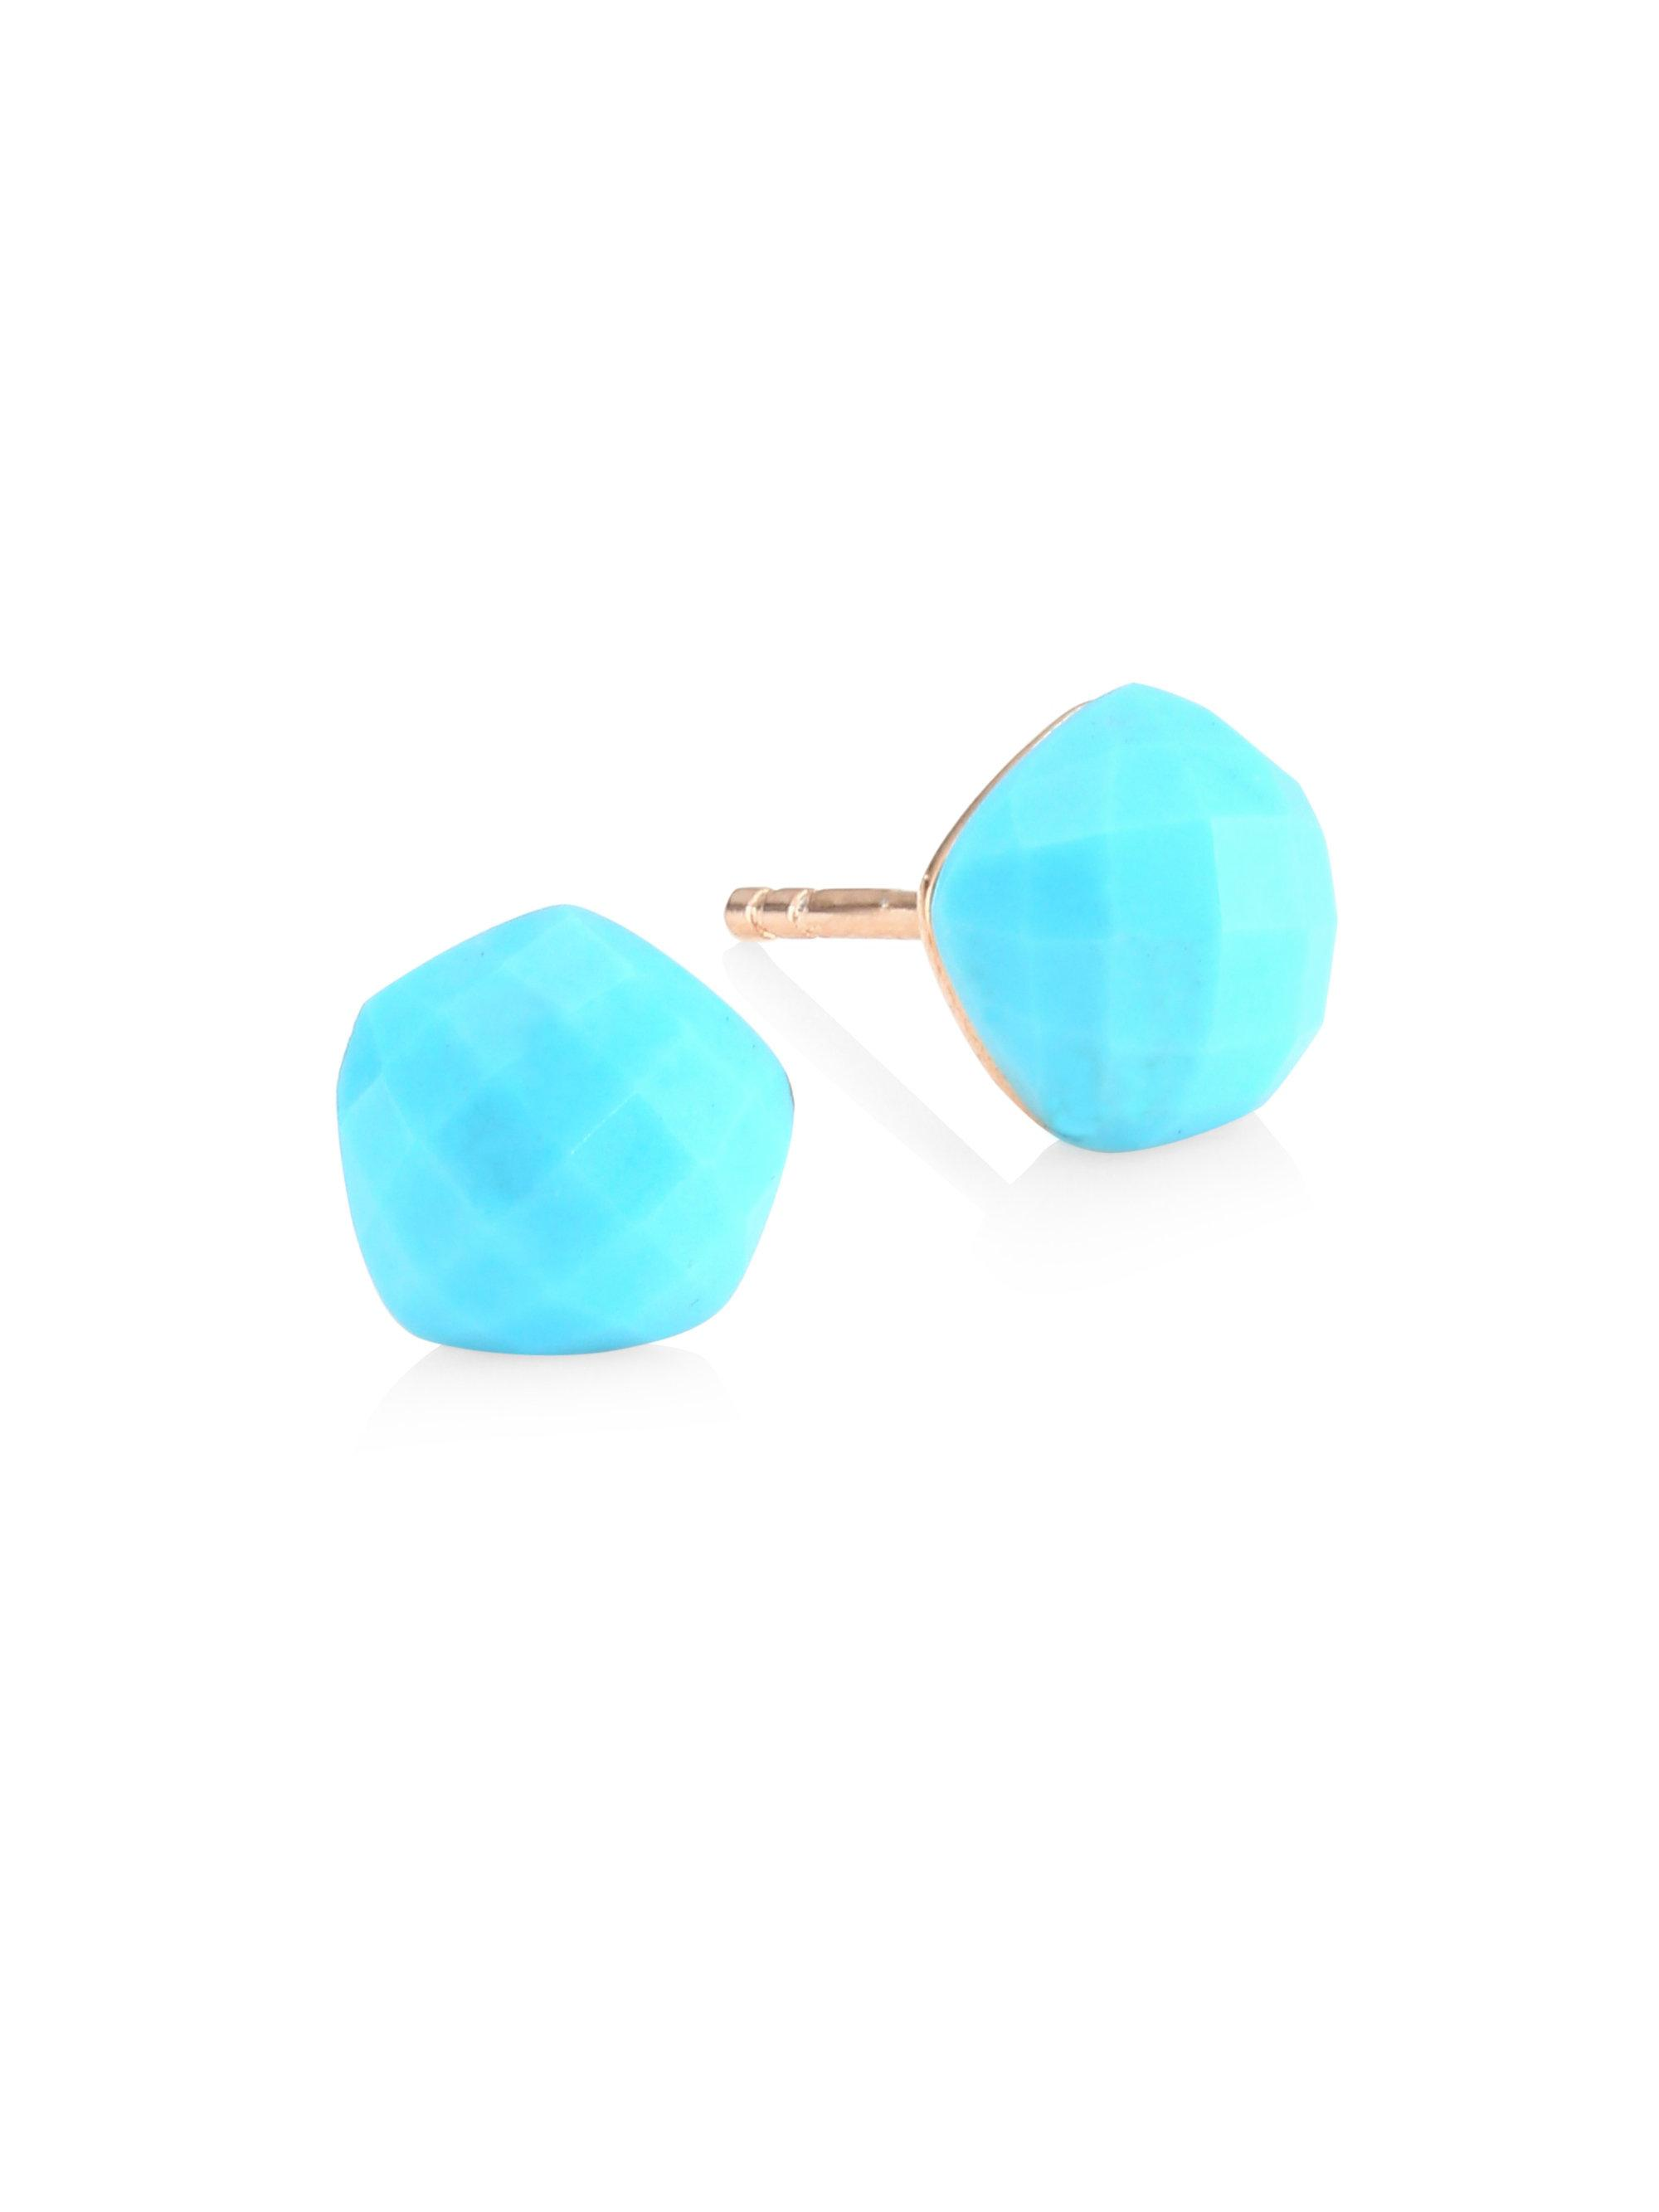 Rose Gold Nura Nugget Stud Earrings Turquoise Monica Vinader 0NDRGzkA